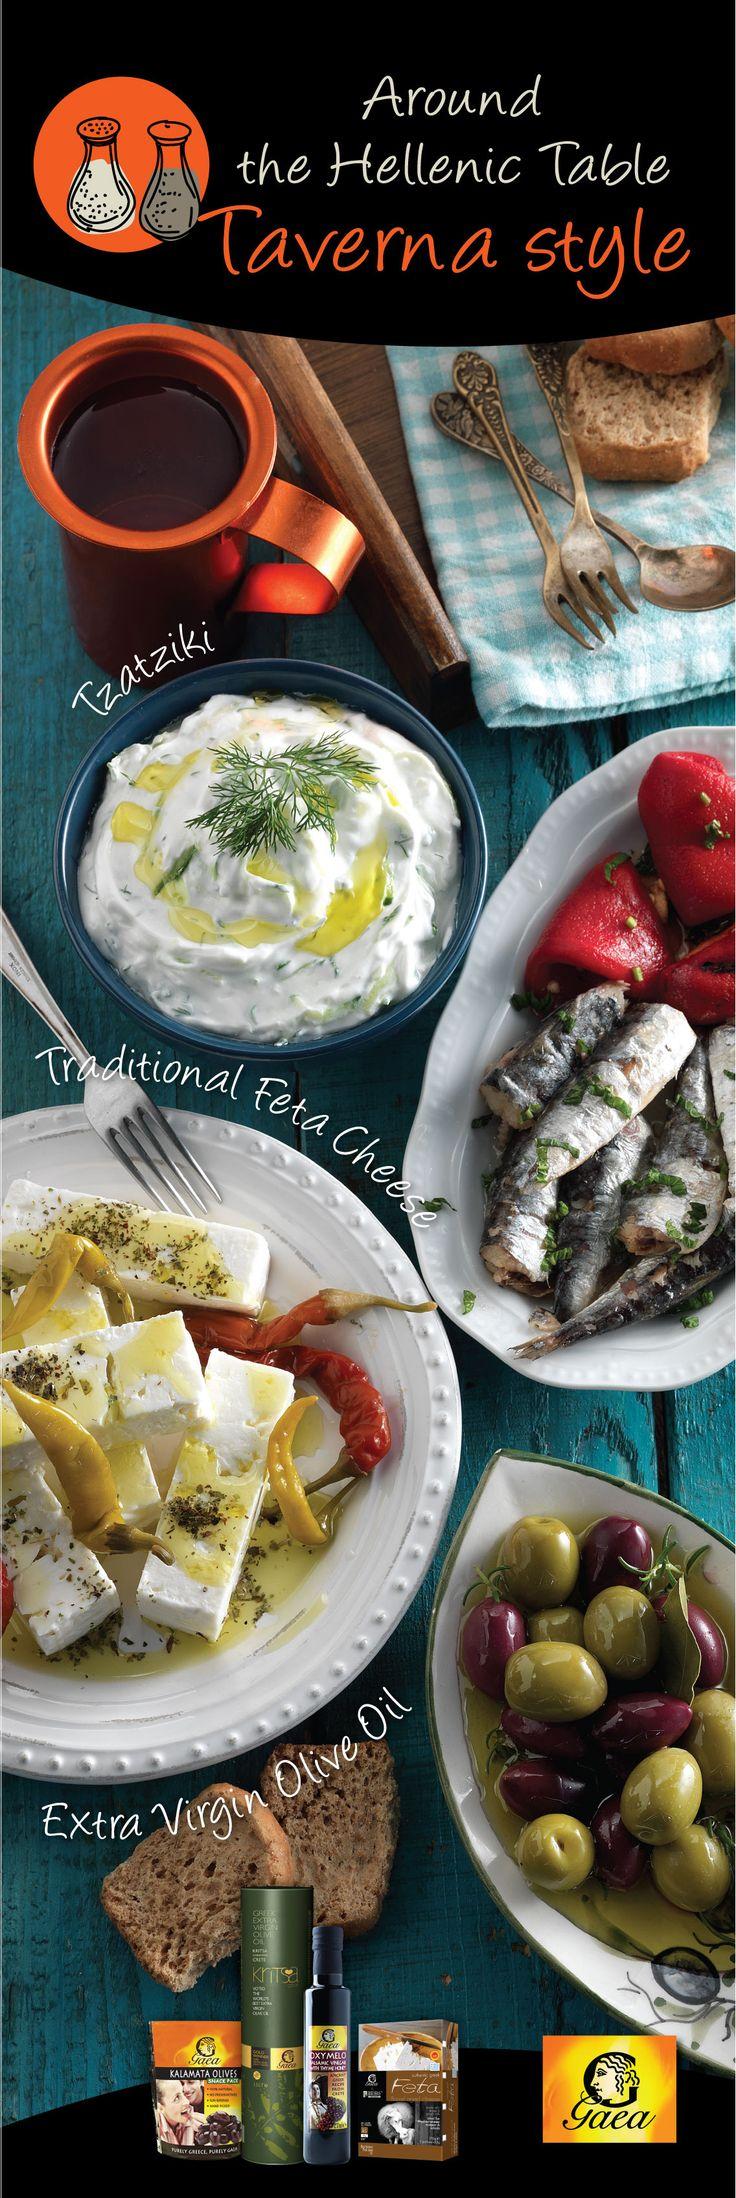 www.gaea.gr The Greek Food-Sharing Experience- Taste the Greek Diet